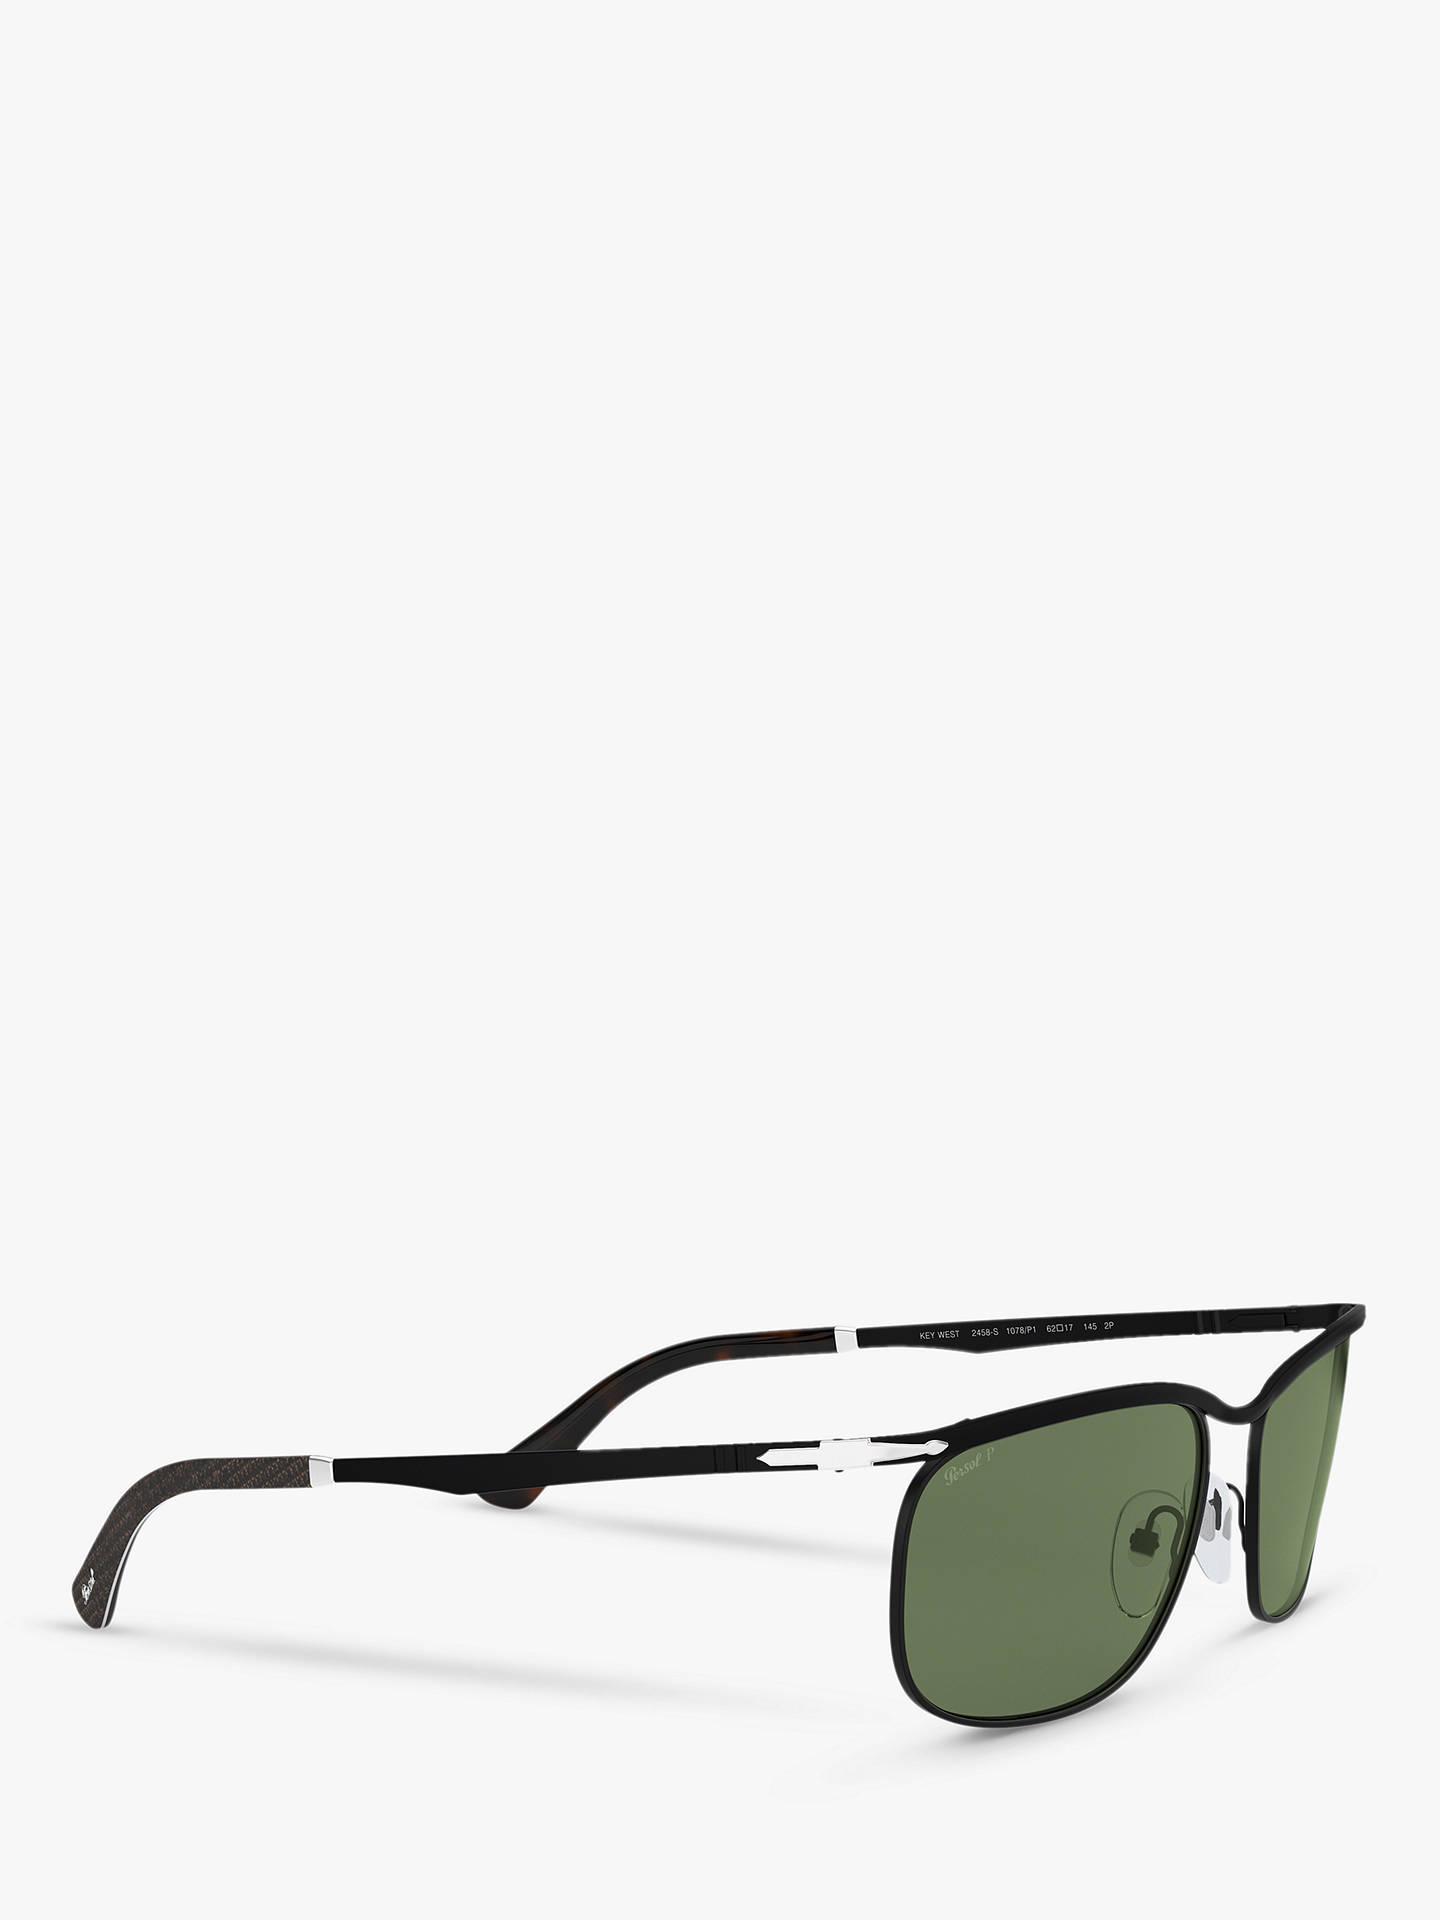 2d09bbad1745 ... Buy Persol PO2458S Men's Polarised Rectangular Sunglasses, Black/Green  Online at johnlewis.com